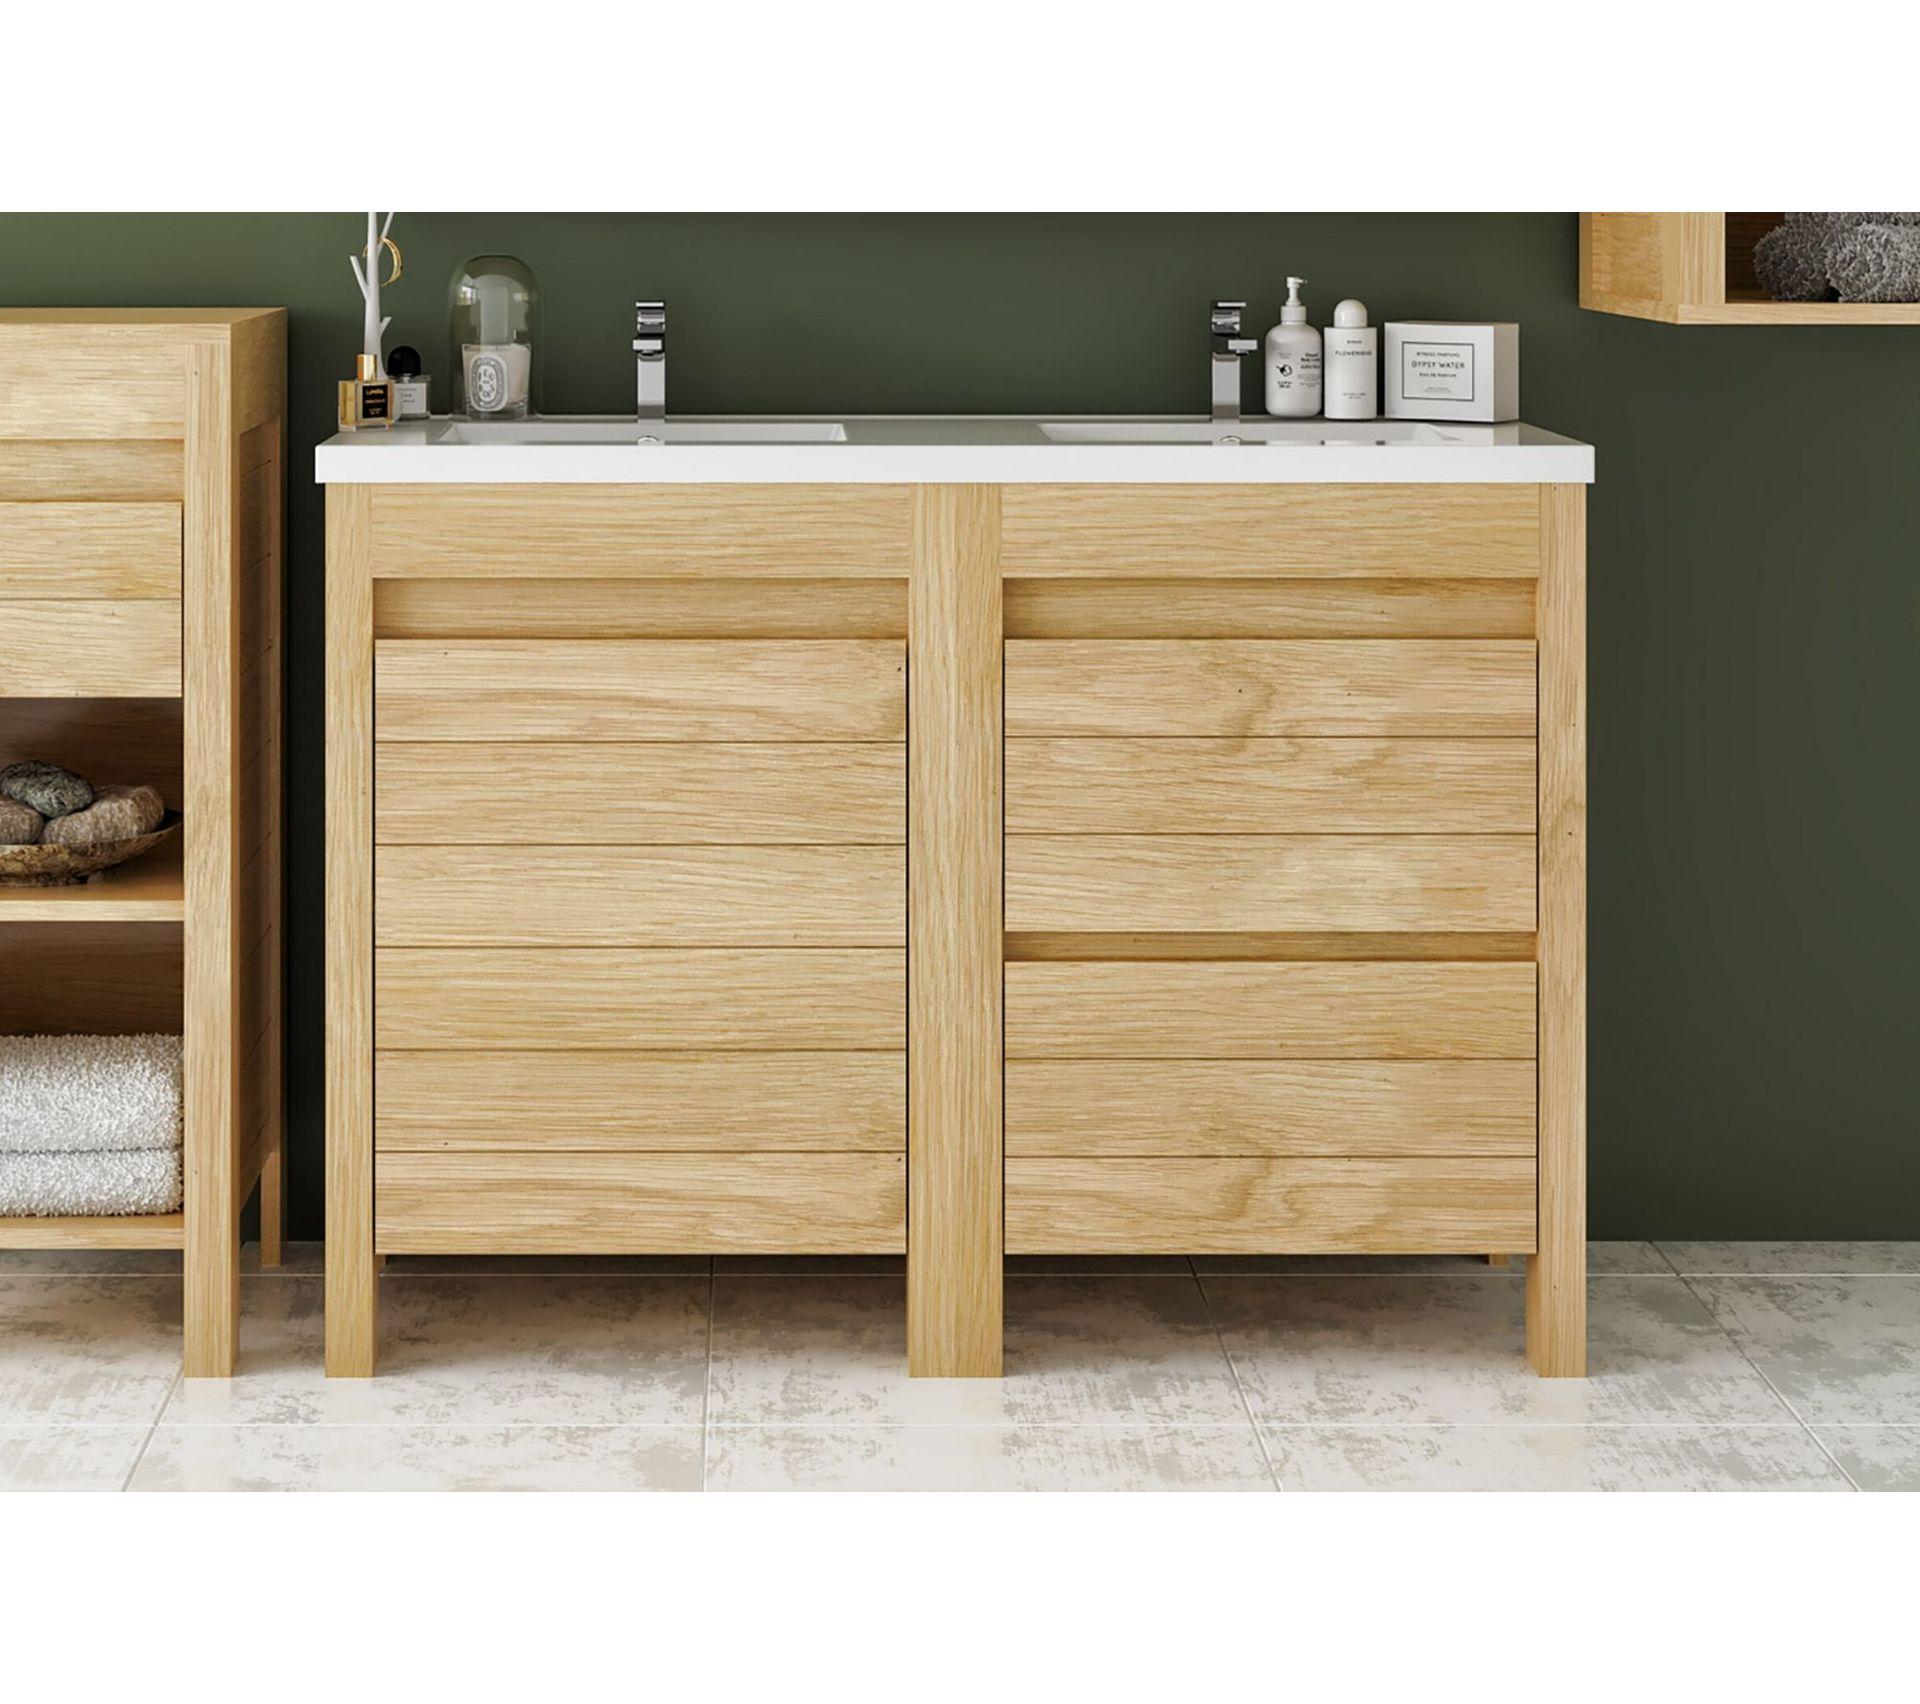 Salle De Bain Avec Bois meuble de salle de bain 120 cm en bois massif avec sa double vasque - cork